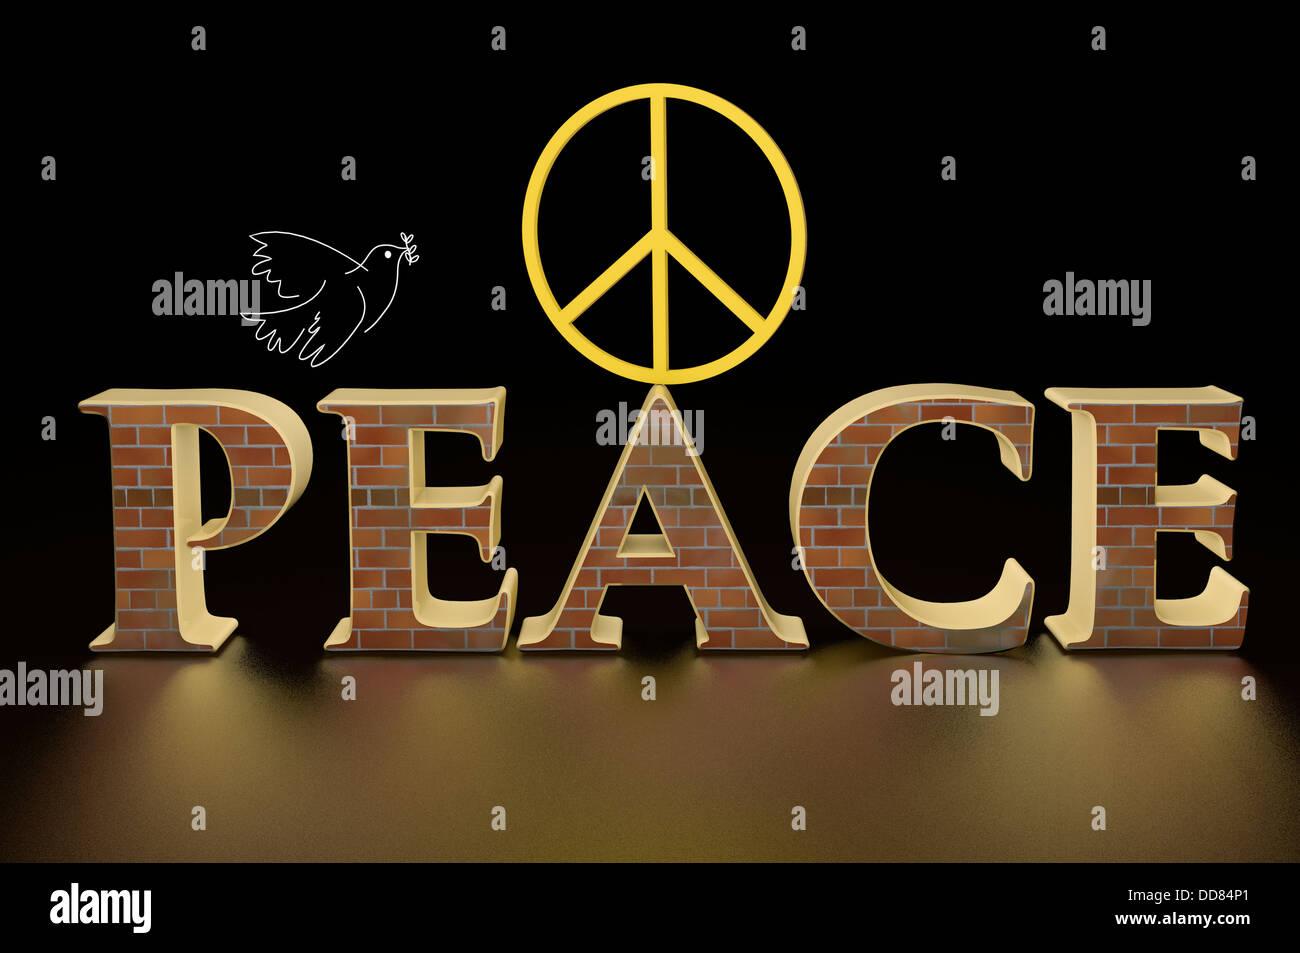 Illustration of the symbols of world peace stock photo 59801001 alamy illustration of the symbols of world peace biocorpaavc Images